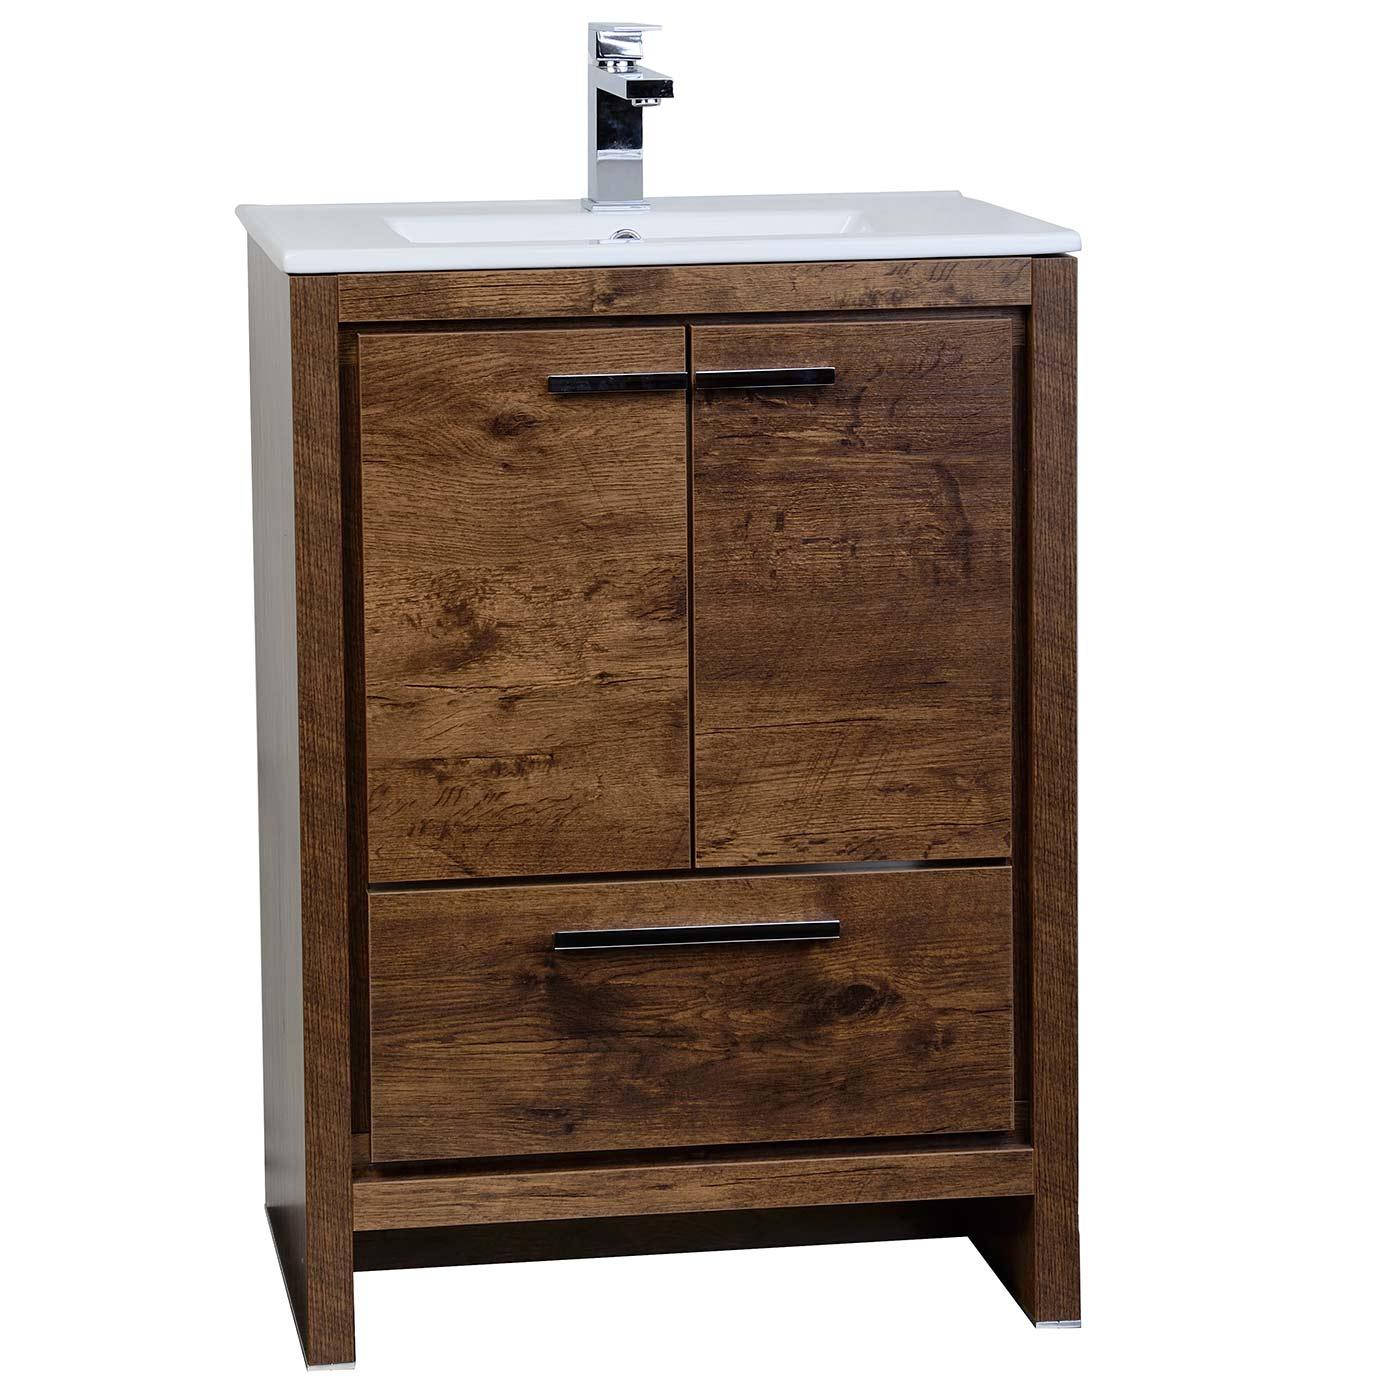 Buy CBI Enna Inch Rosewood Modern Bathroom Vanity TNLARW - 24 contemporary bathroom vanity